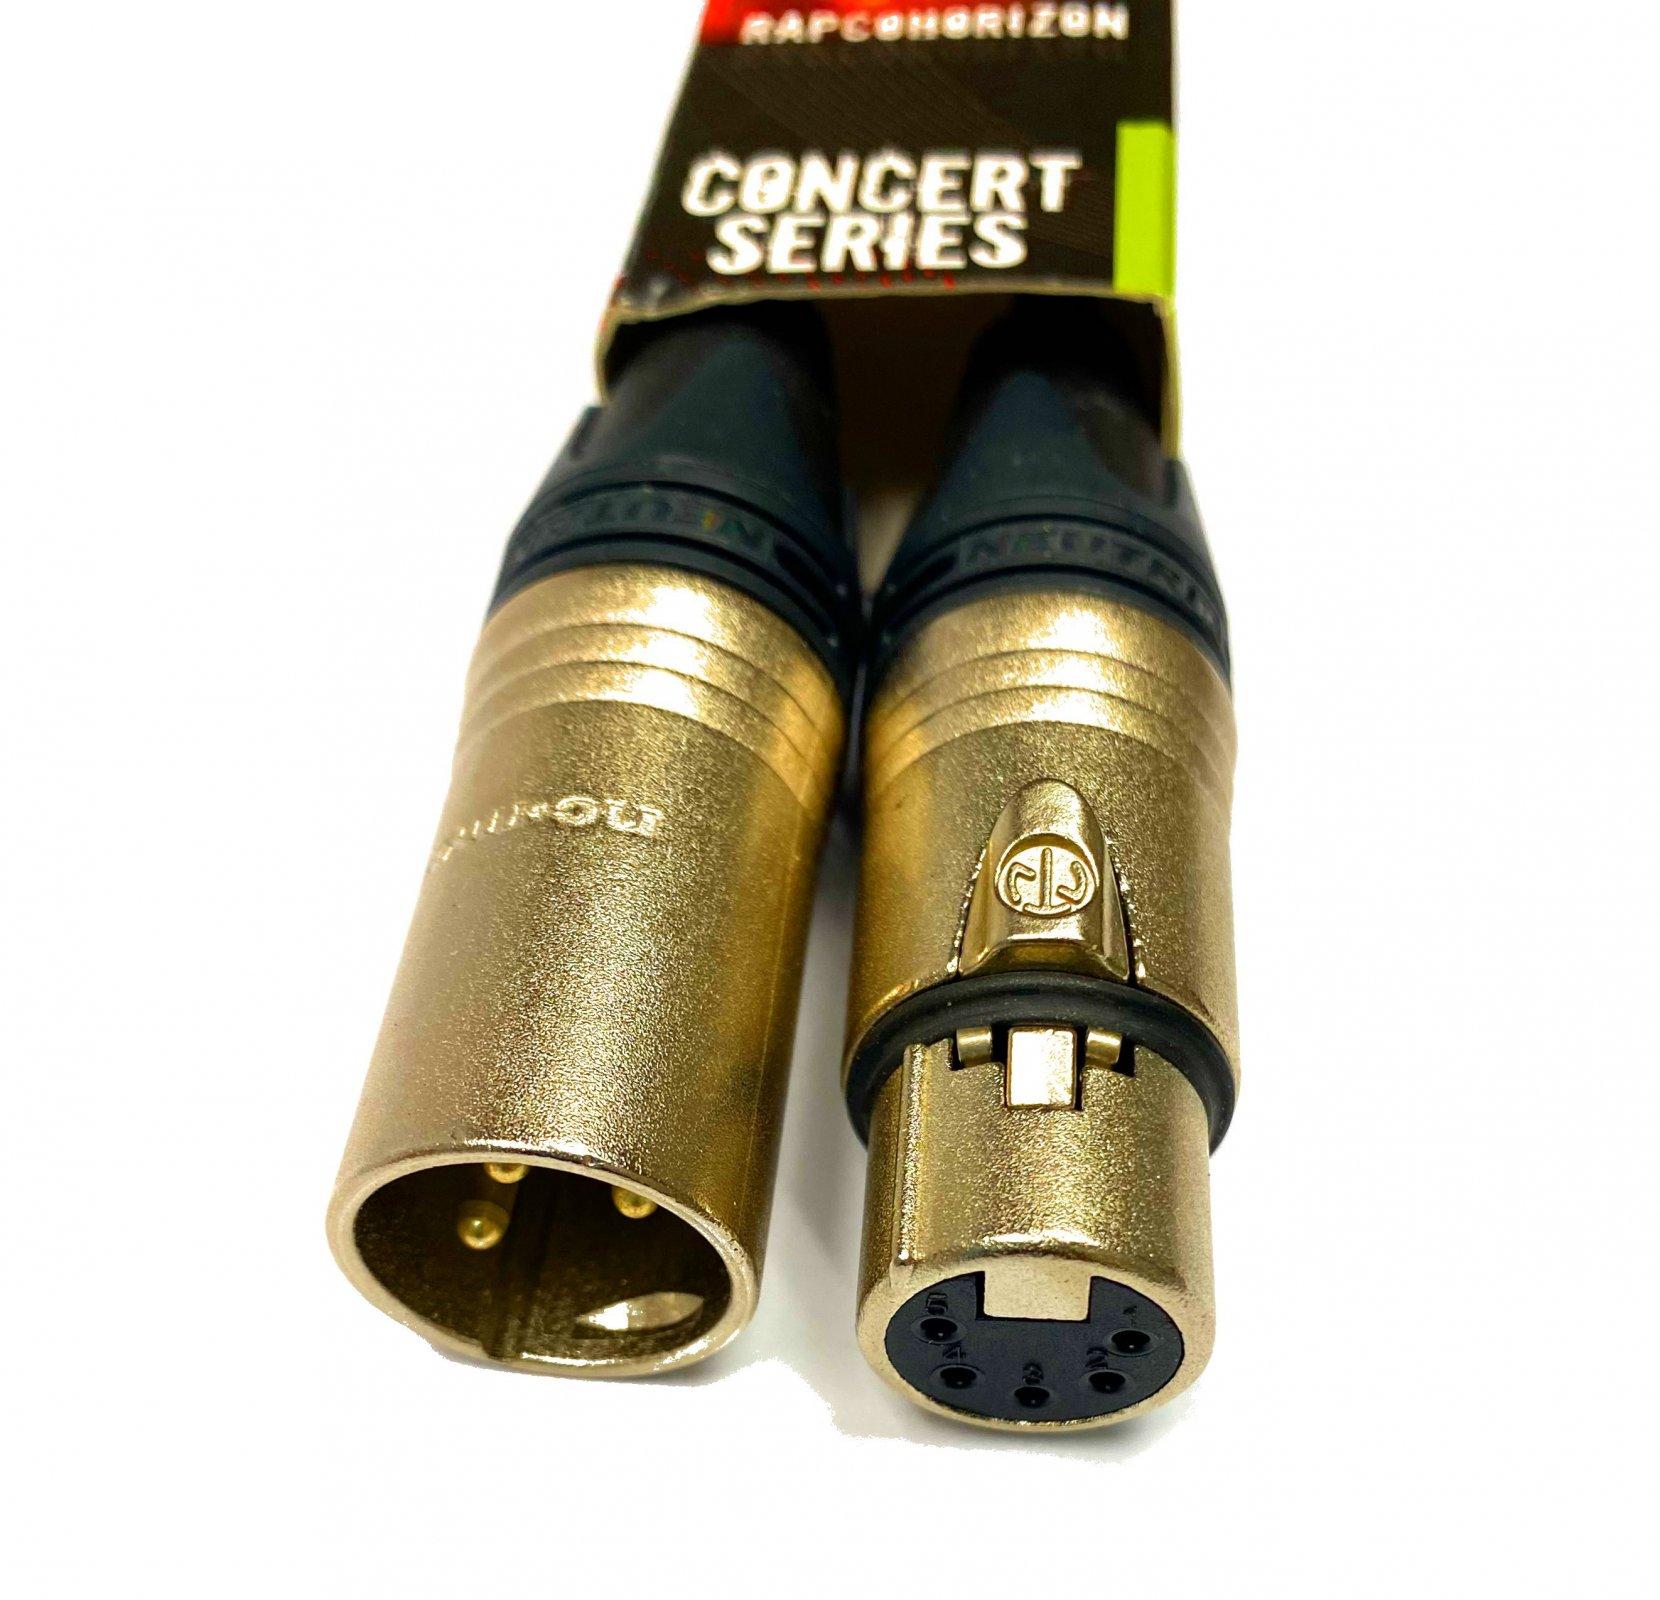 RapcoHorizon 3-pin Male-5-pin Female DMX Adaptor Cable